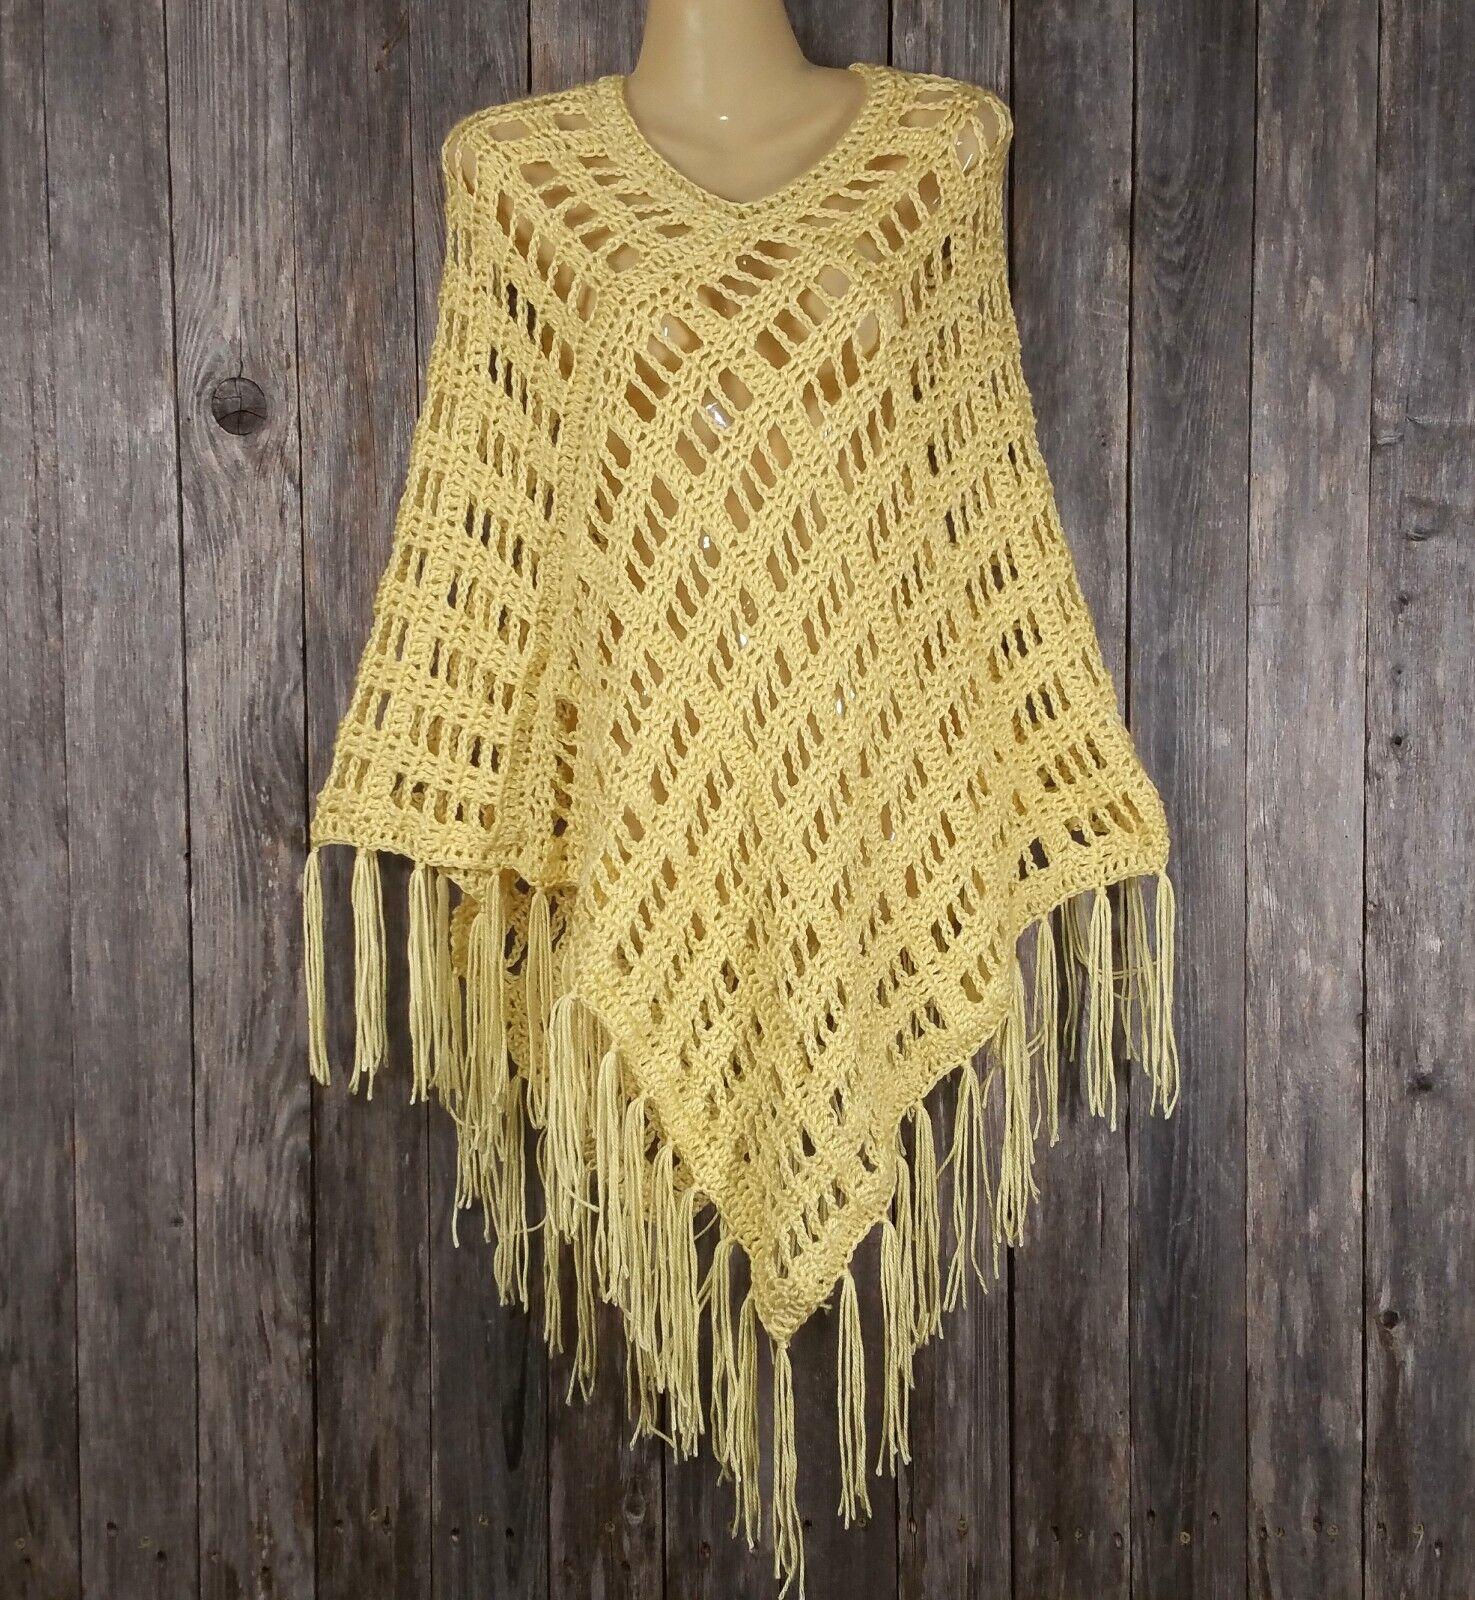 Hecho a mano para mujer Nuevo amarillo Mano Crochet Crochet Crochet Flecos Poncho Suéter Boho Hippie Suave 9658d7